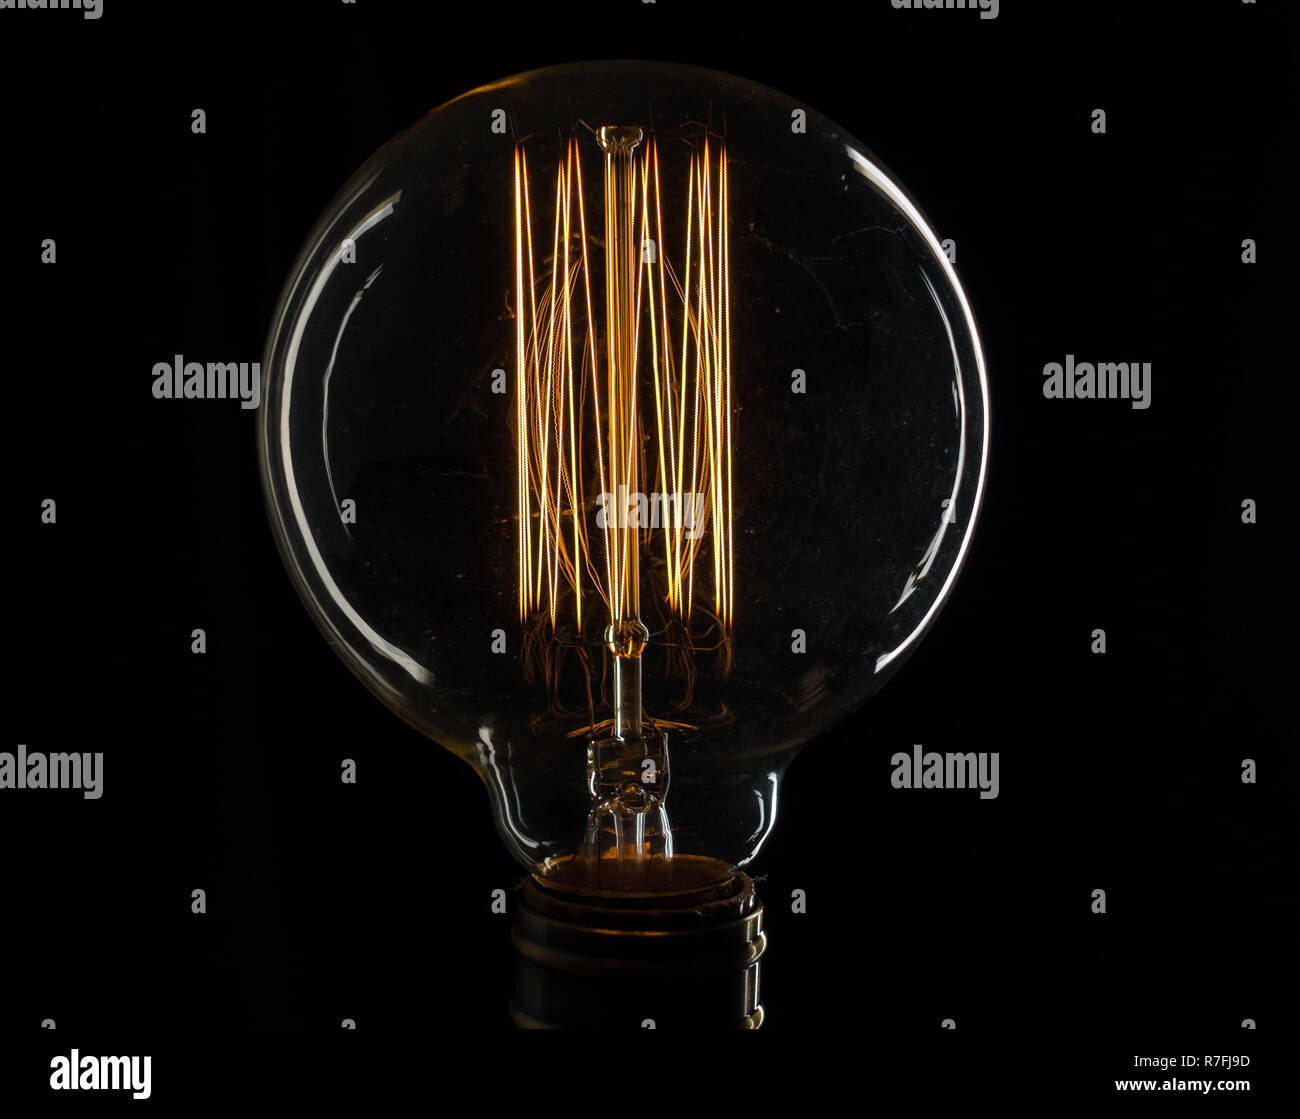 La Lampe A Incandescence De Thomas Edison Illumine De Courant